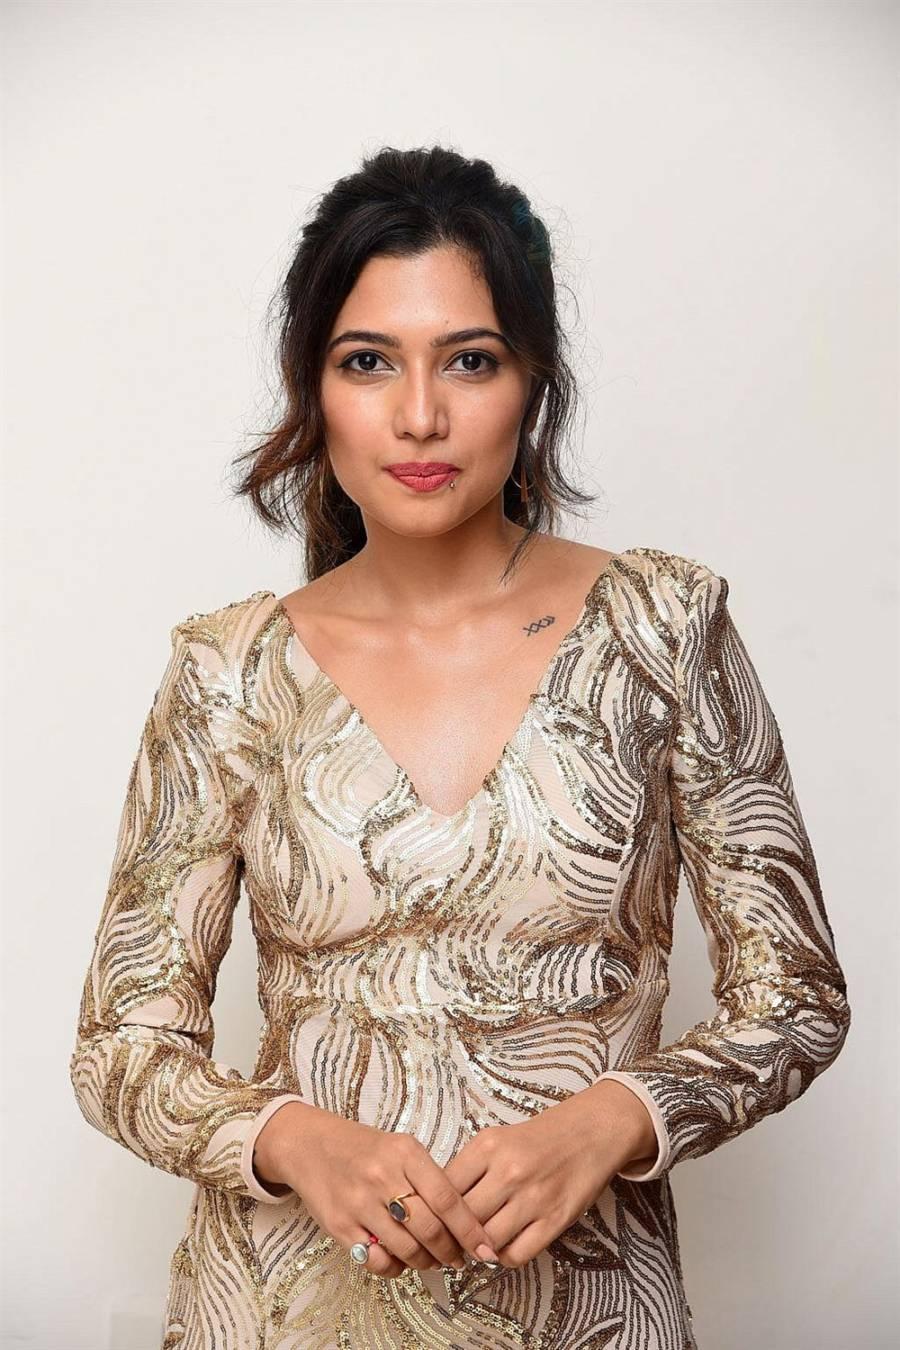 Beautiful Indian Girl Anshula Photoshoot In White Dress